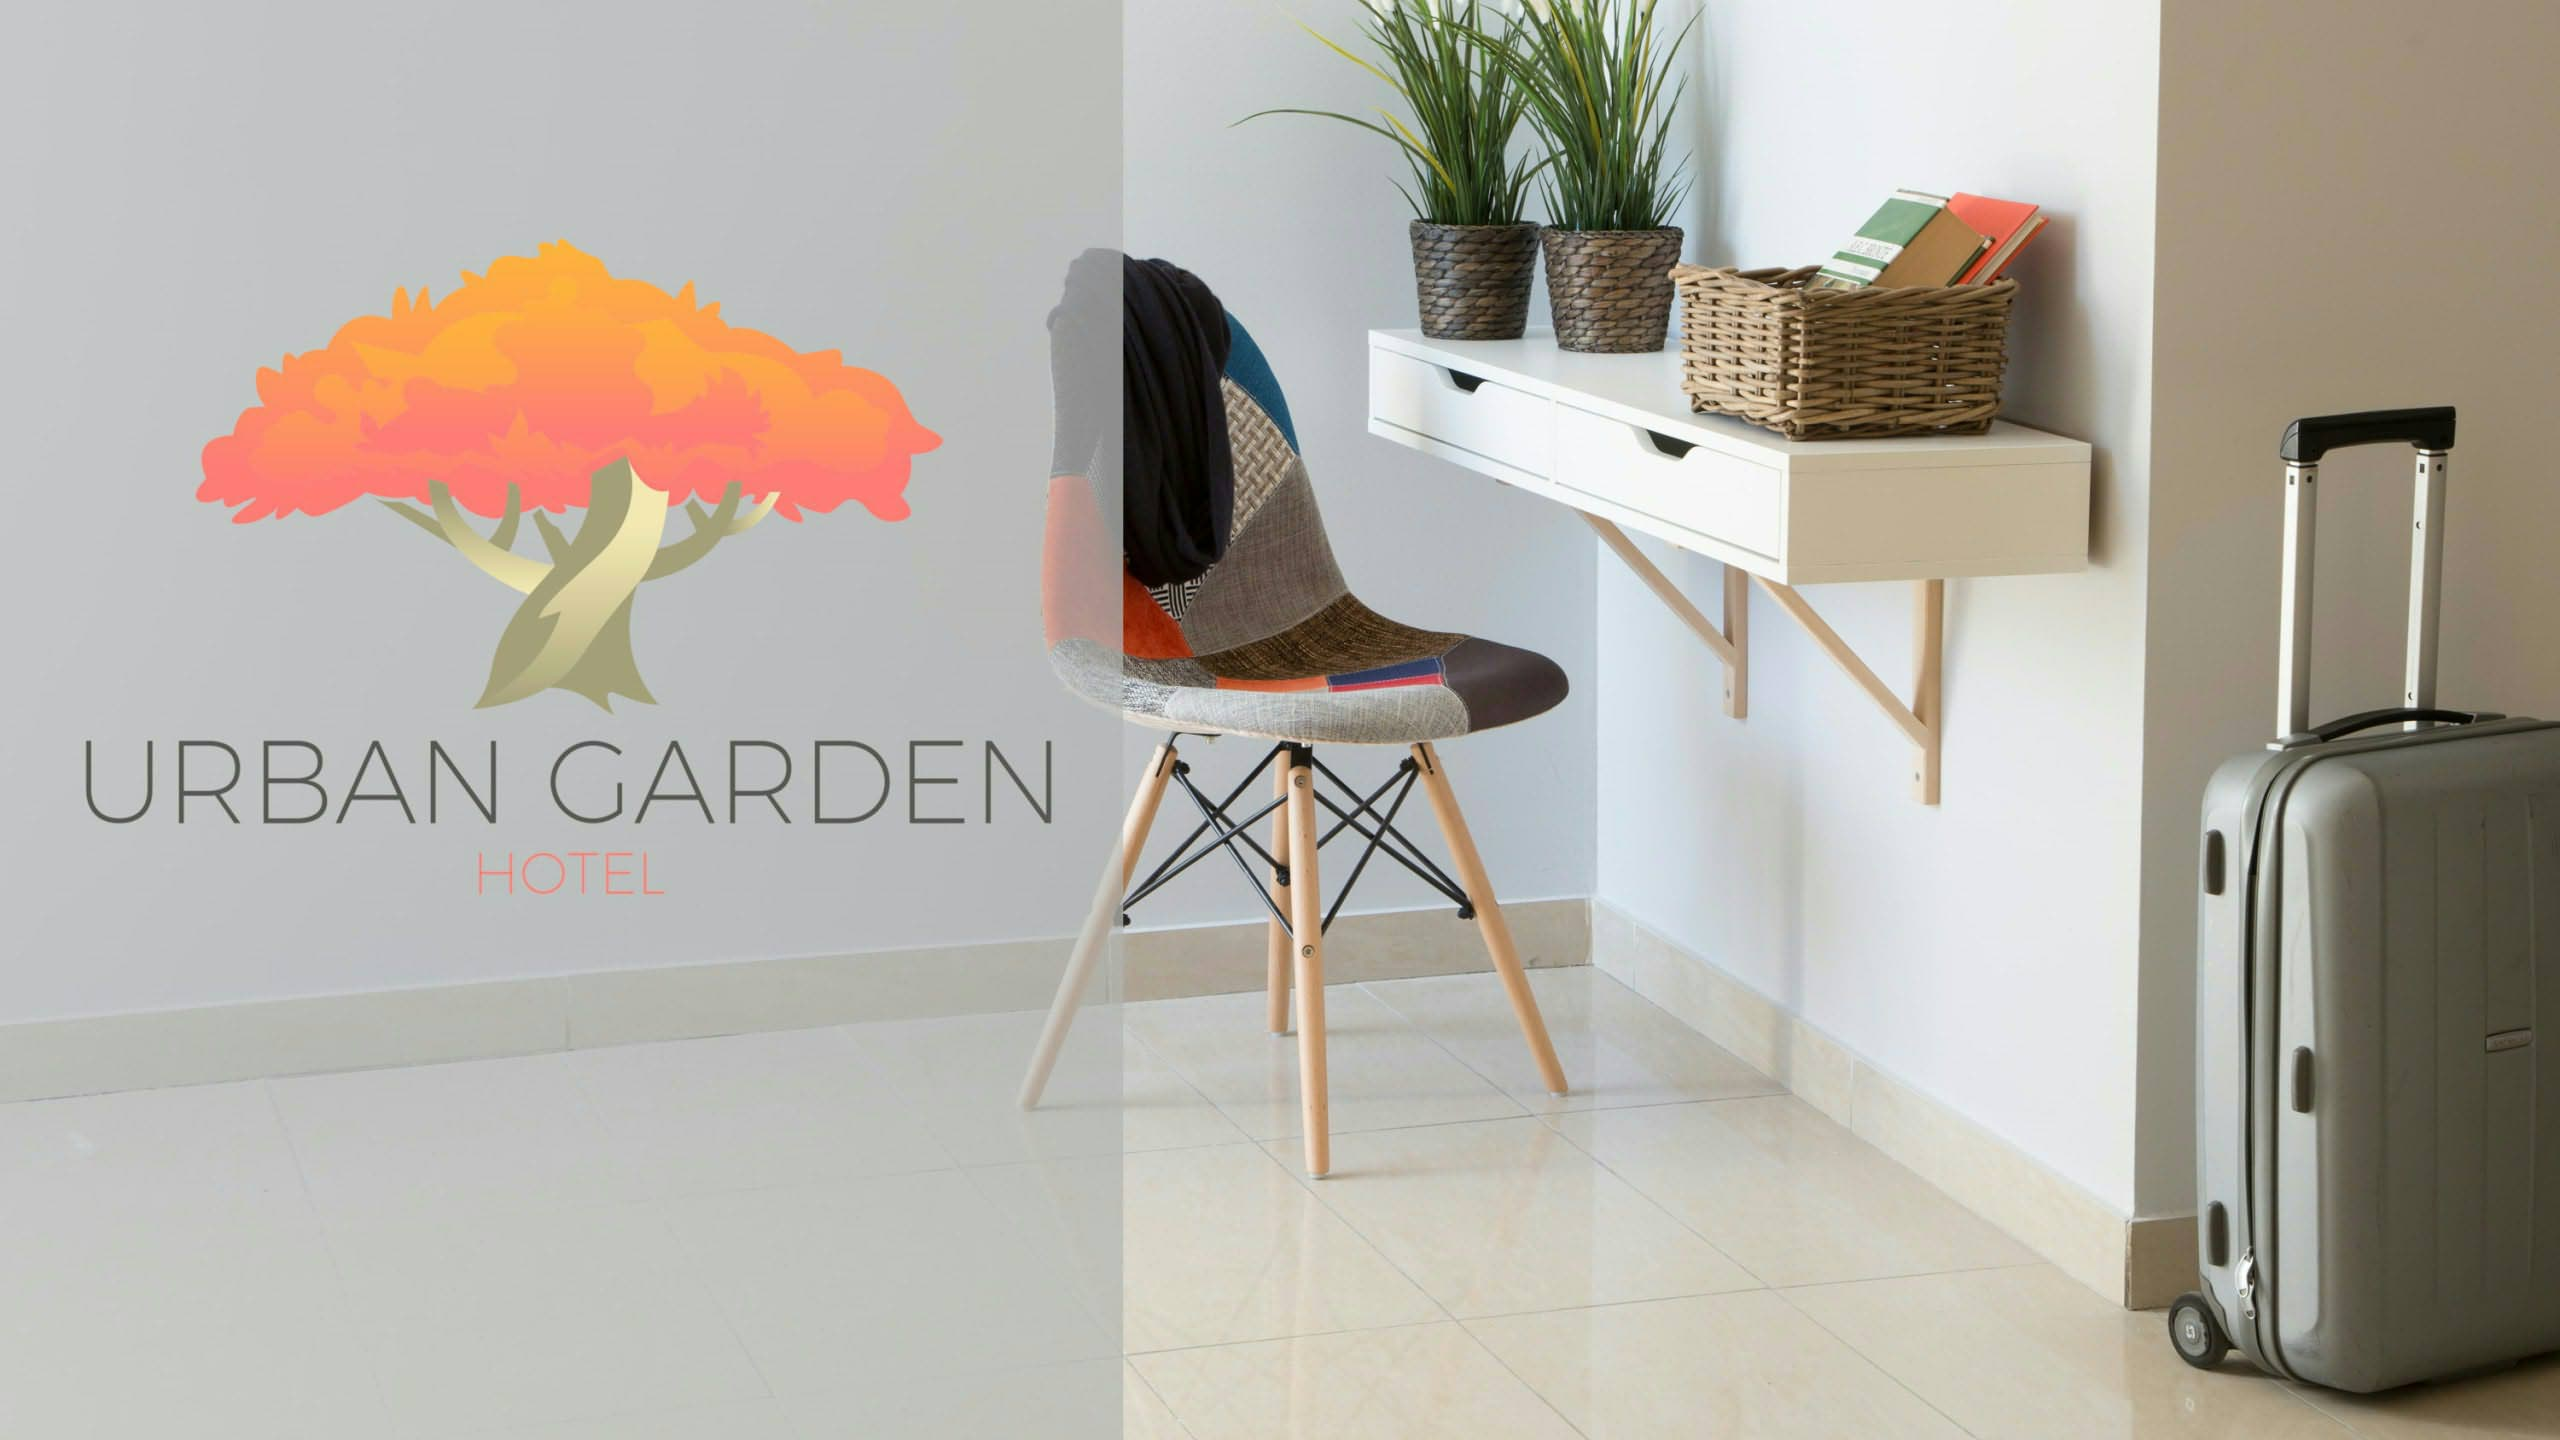 urbangarden-hotel-4605